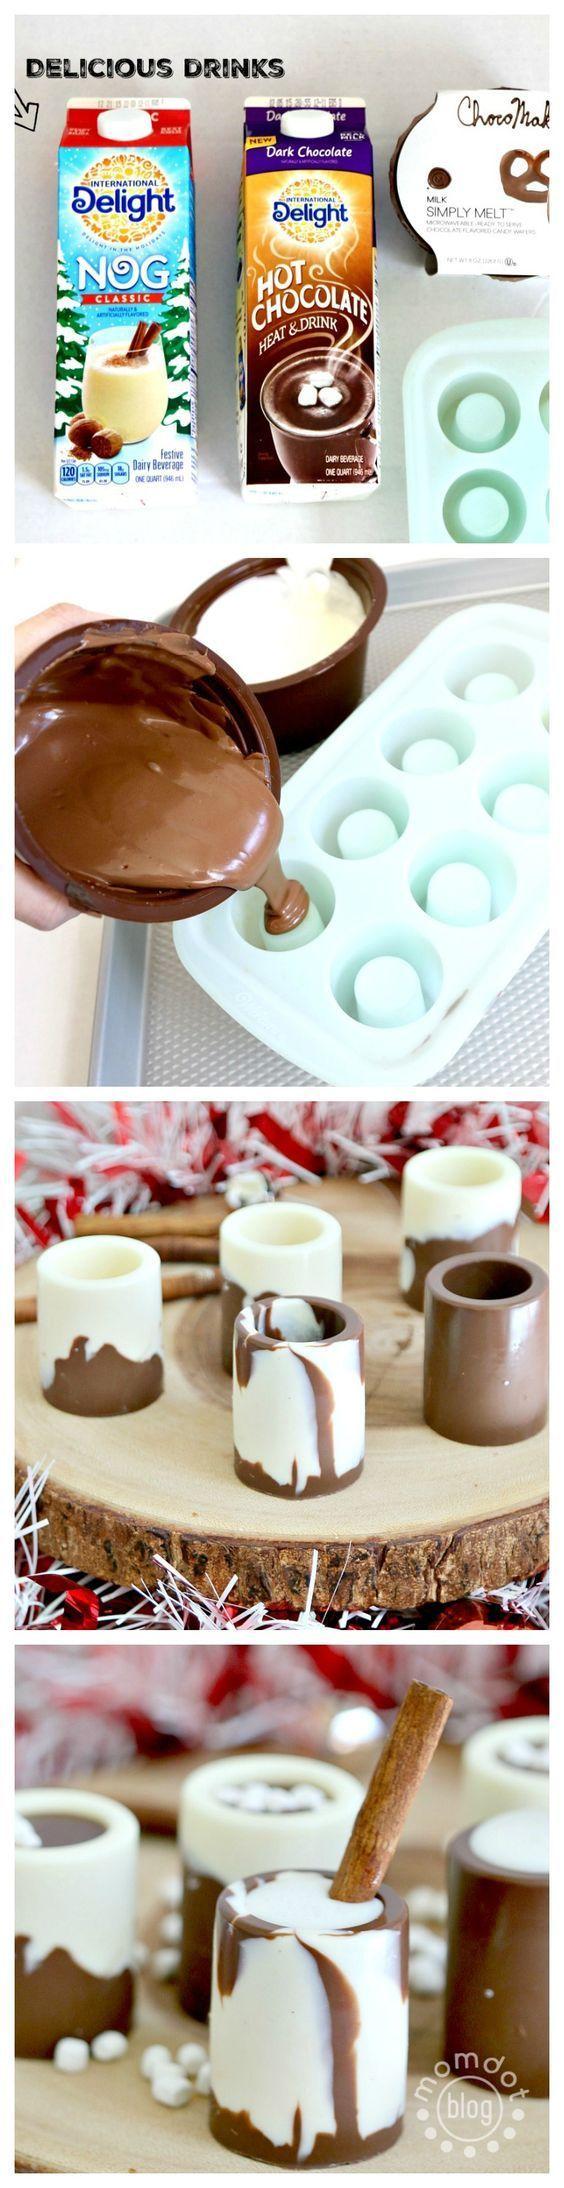 Egg Nog and Chocolate Shooters, How to make Egg Nog Shot glasses like a boss !